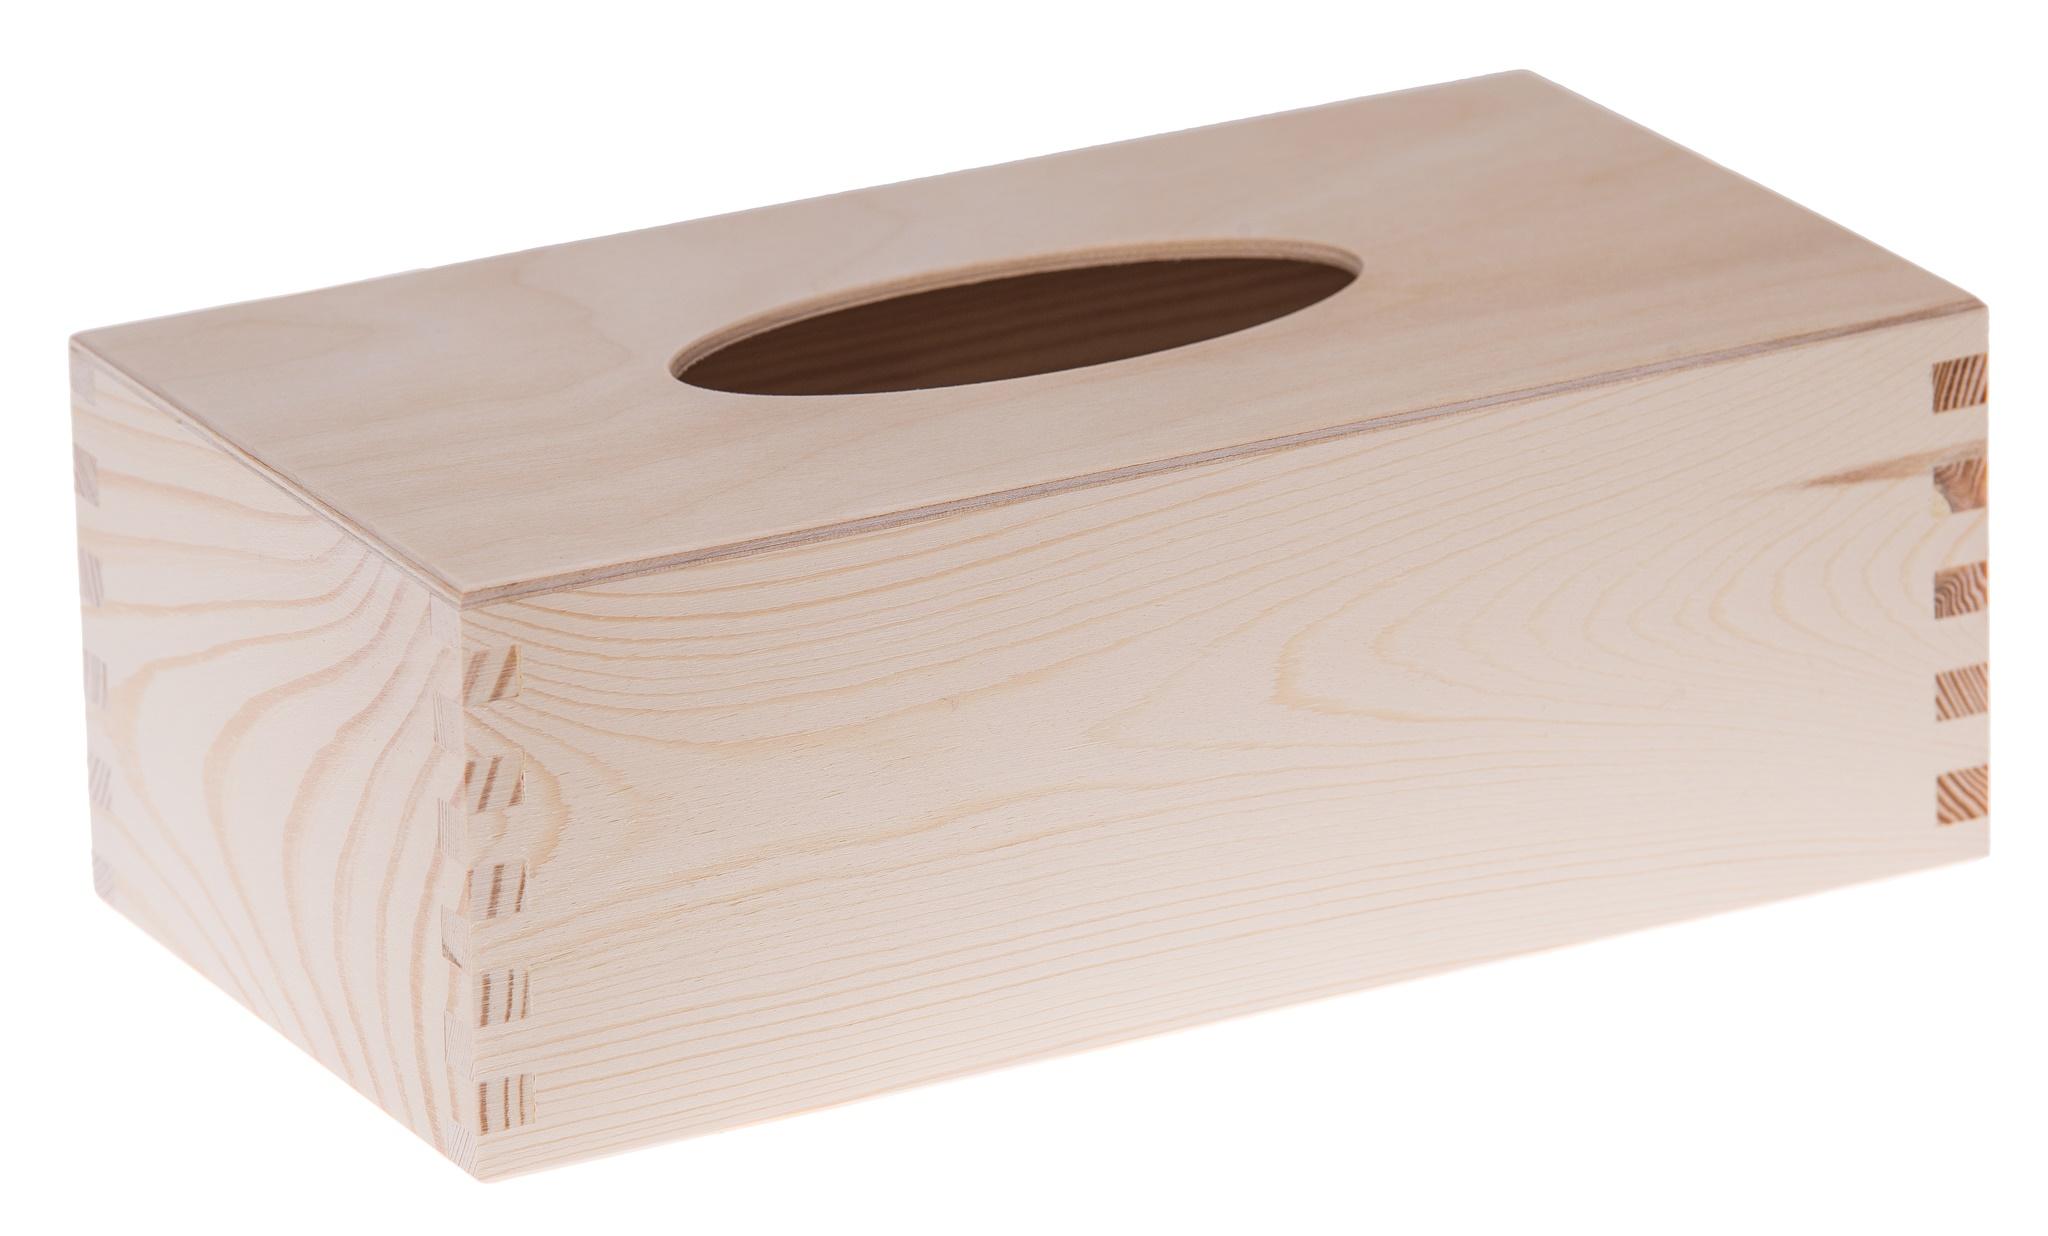 Item CHUSTECZNIK wooden napkin box DECOUPAGE